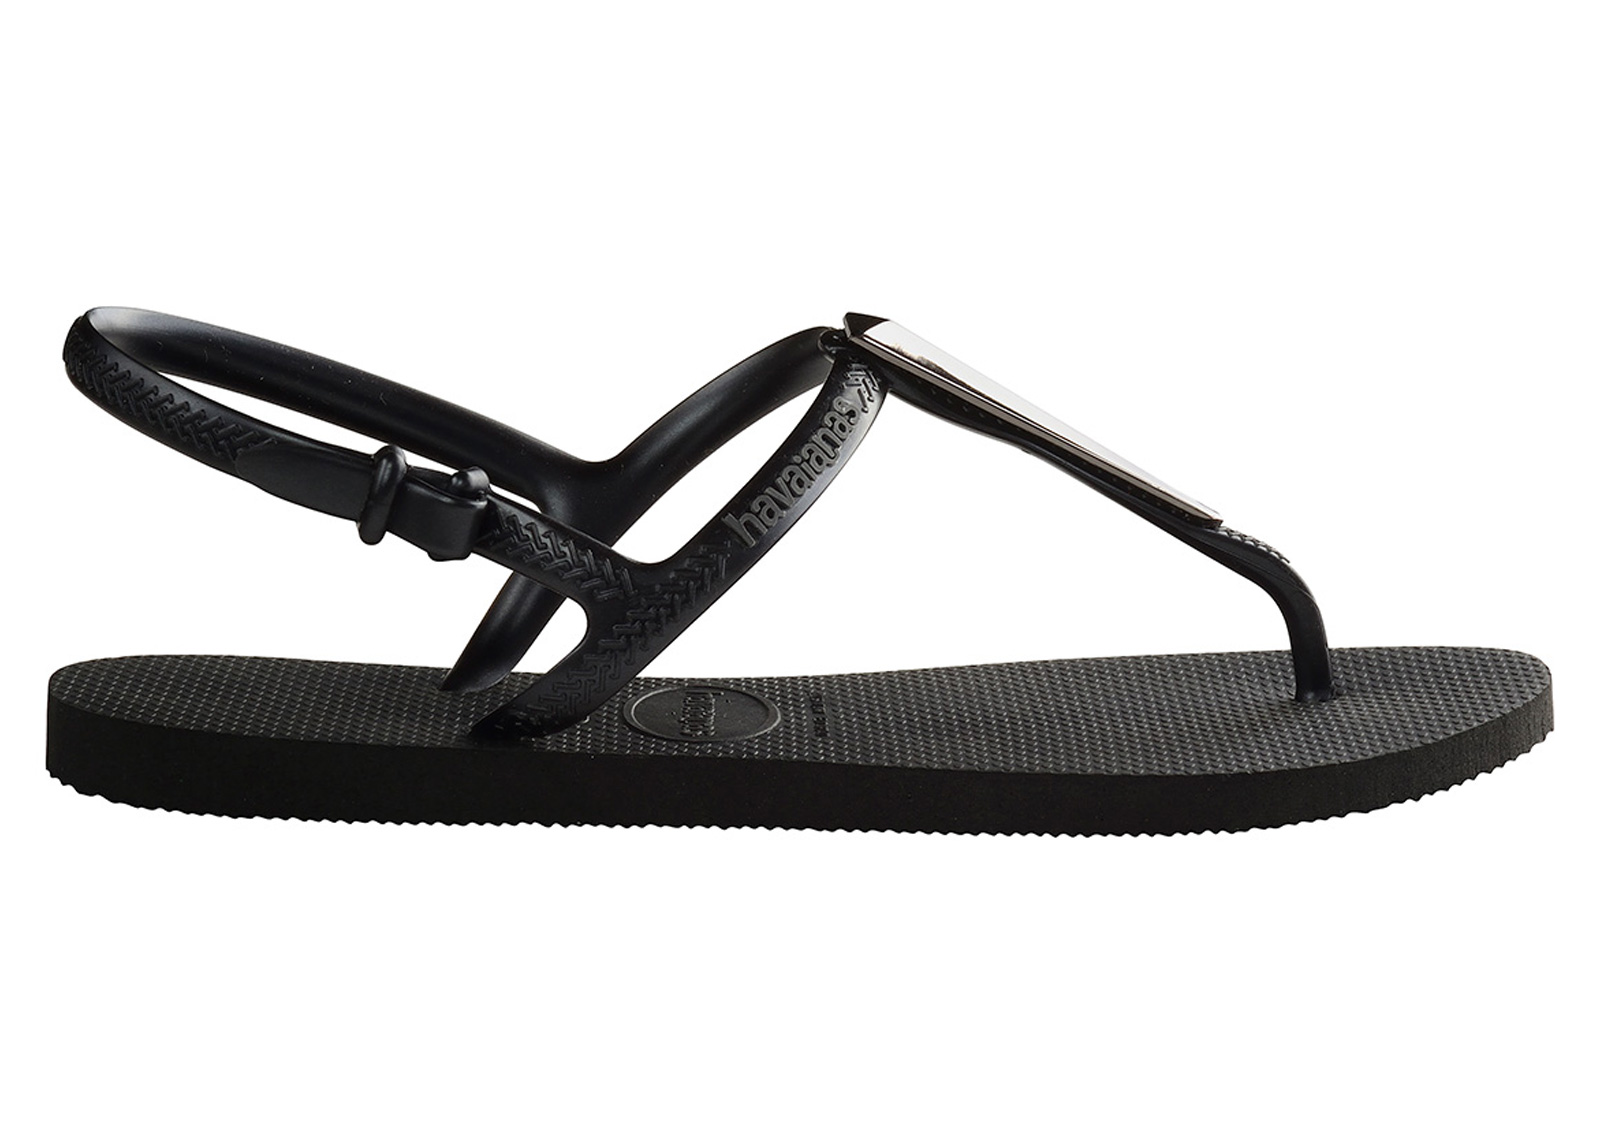 54c6295b848280 Flip-Flops Freedom Maxi Black - Brand Havaianas